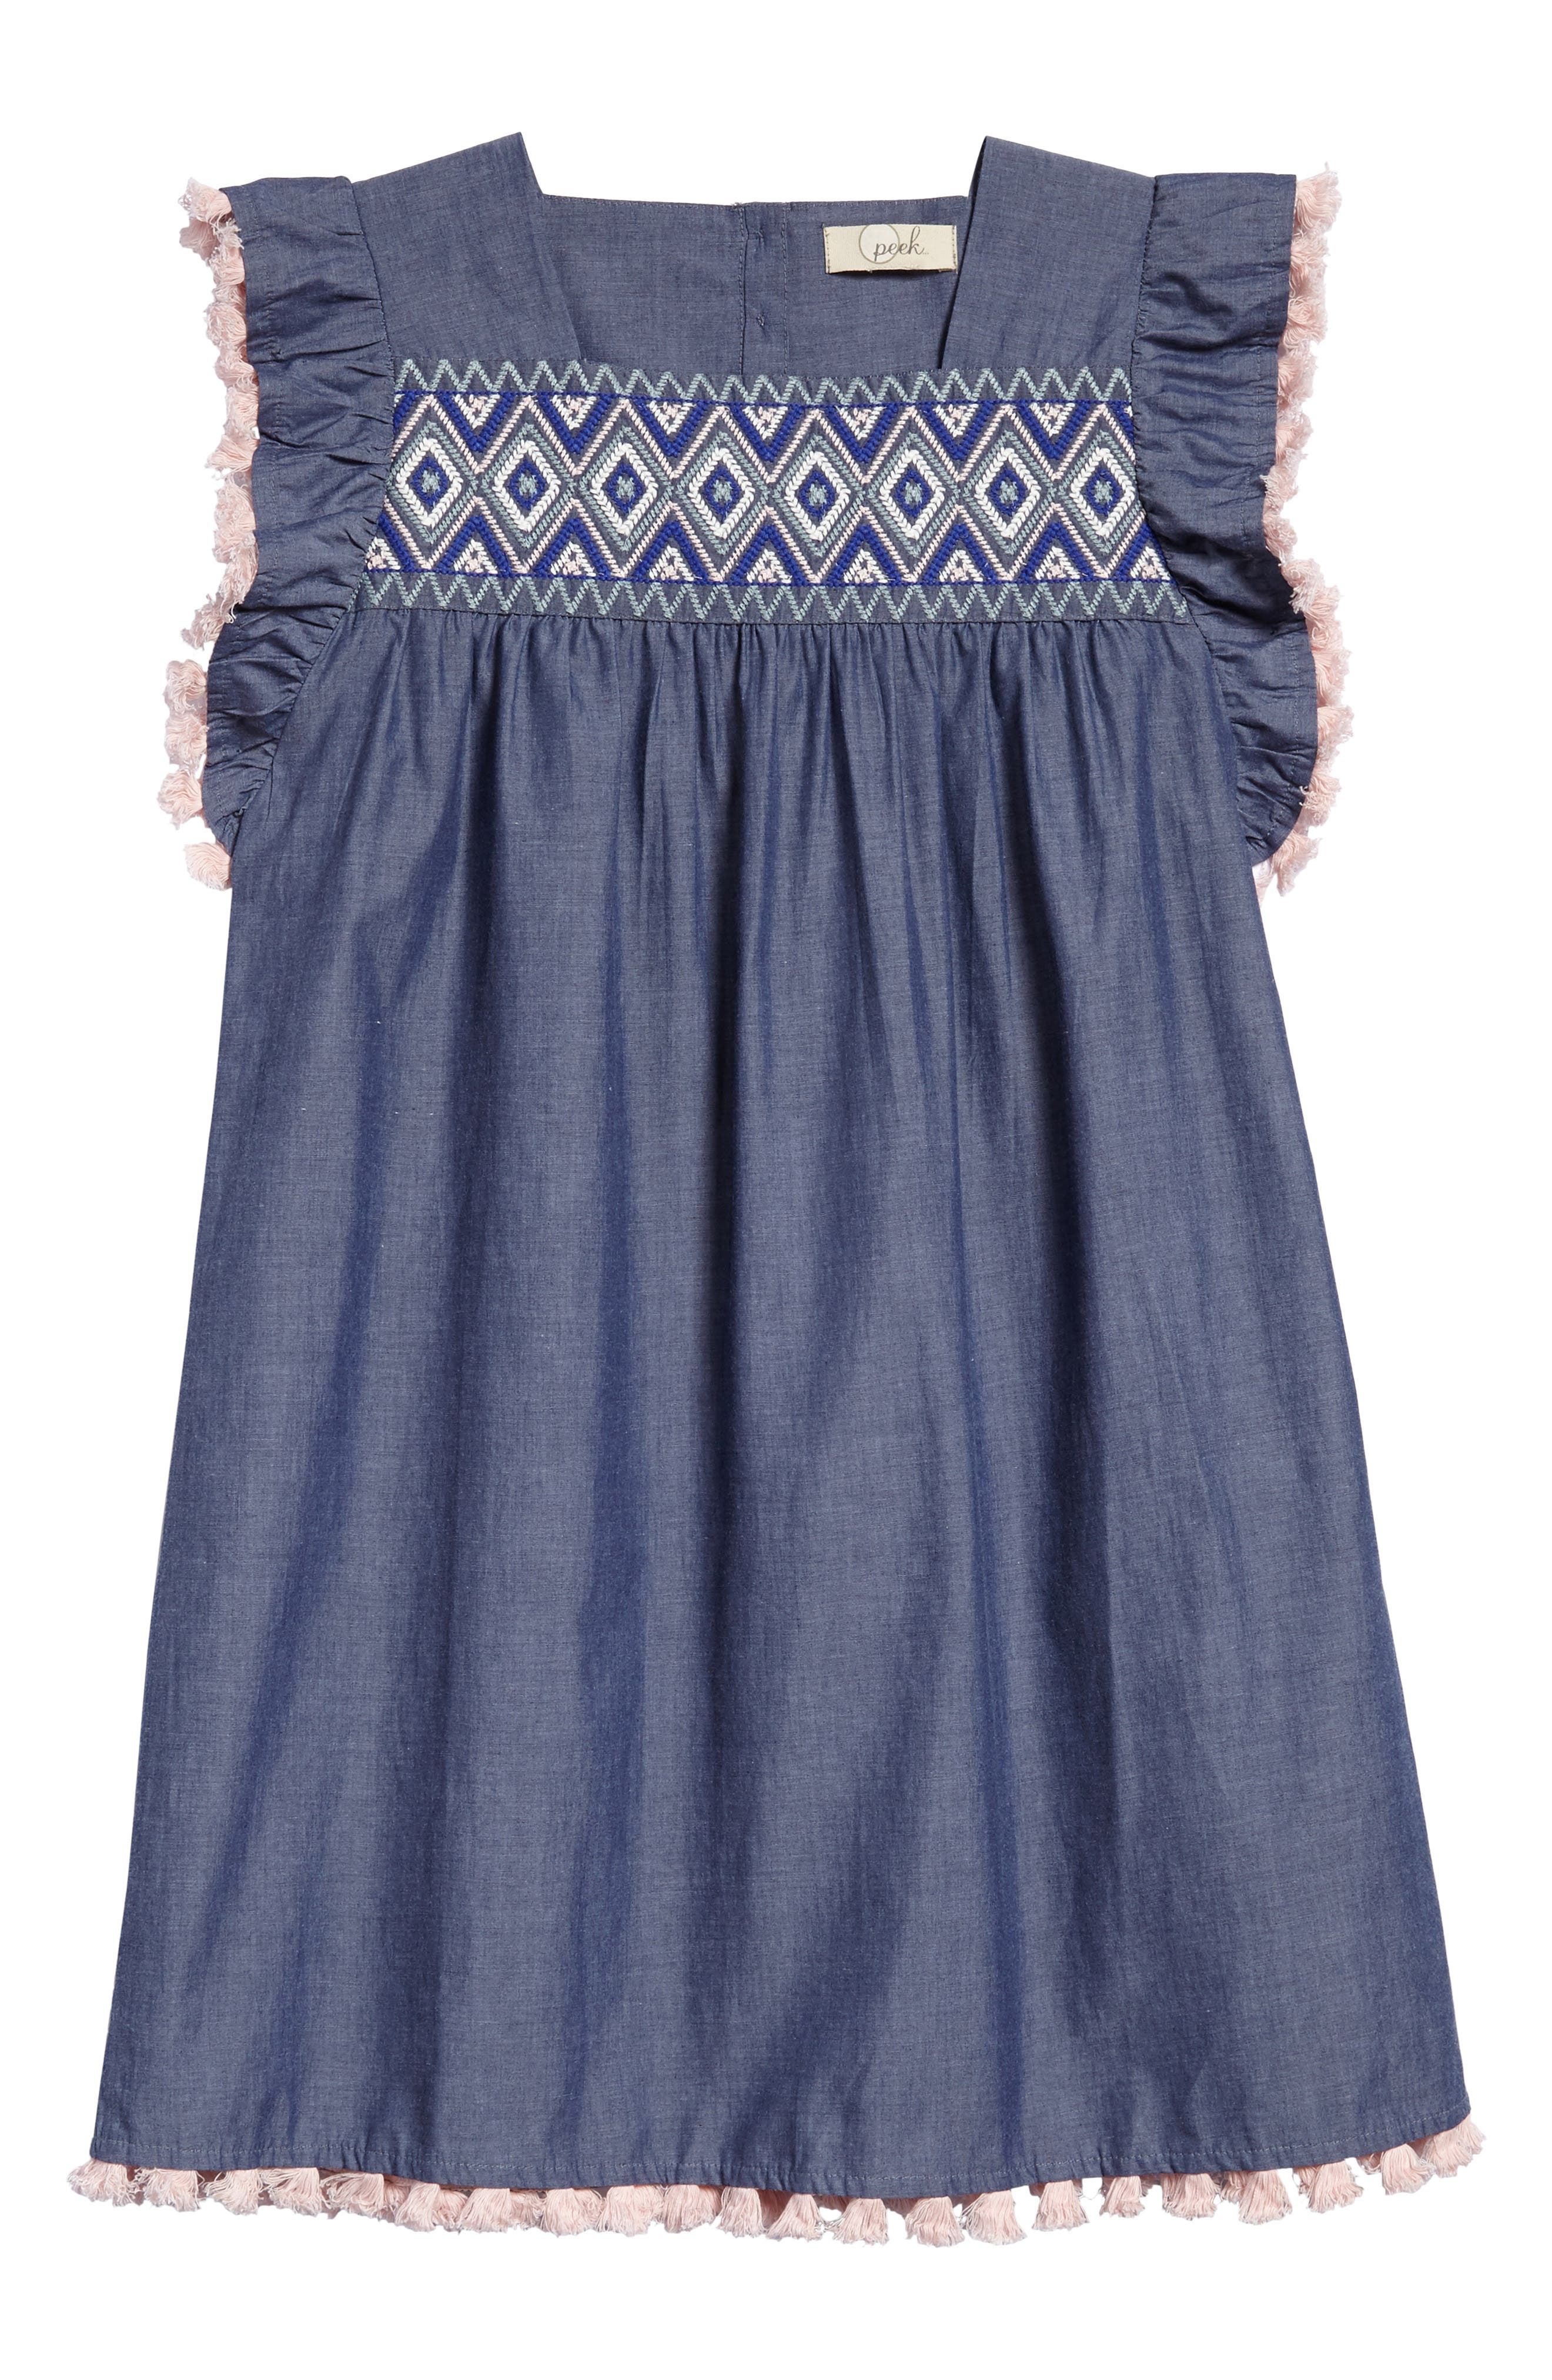 Sophia Embroidered Dress,                             Main thumbnail 1, color,